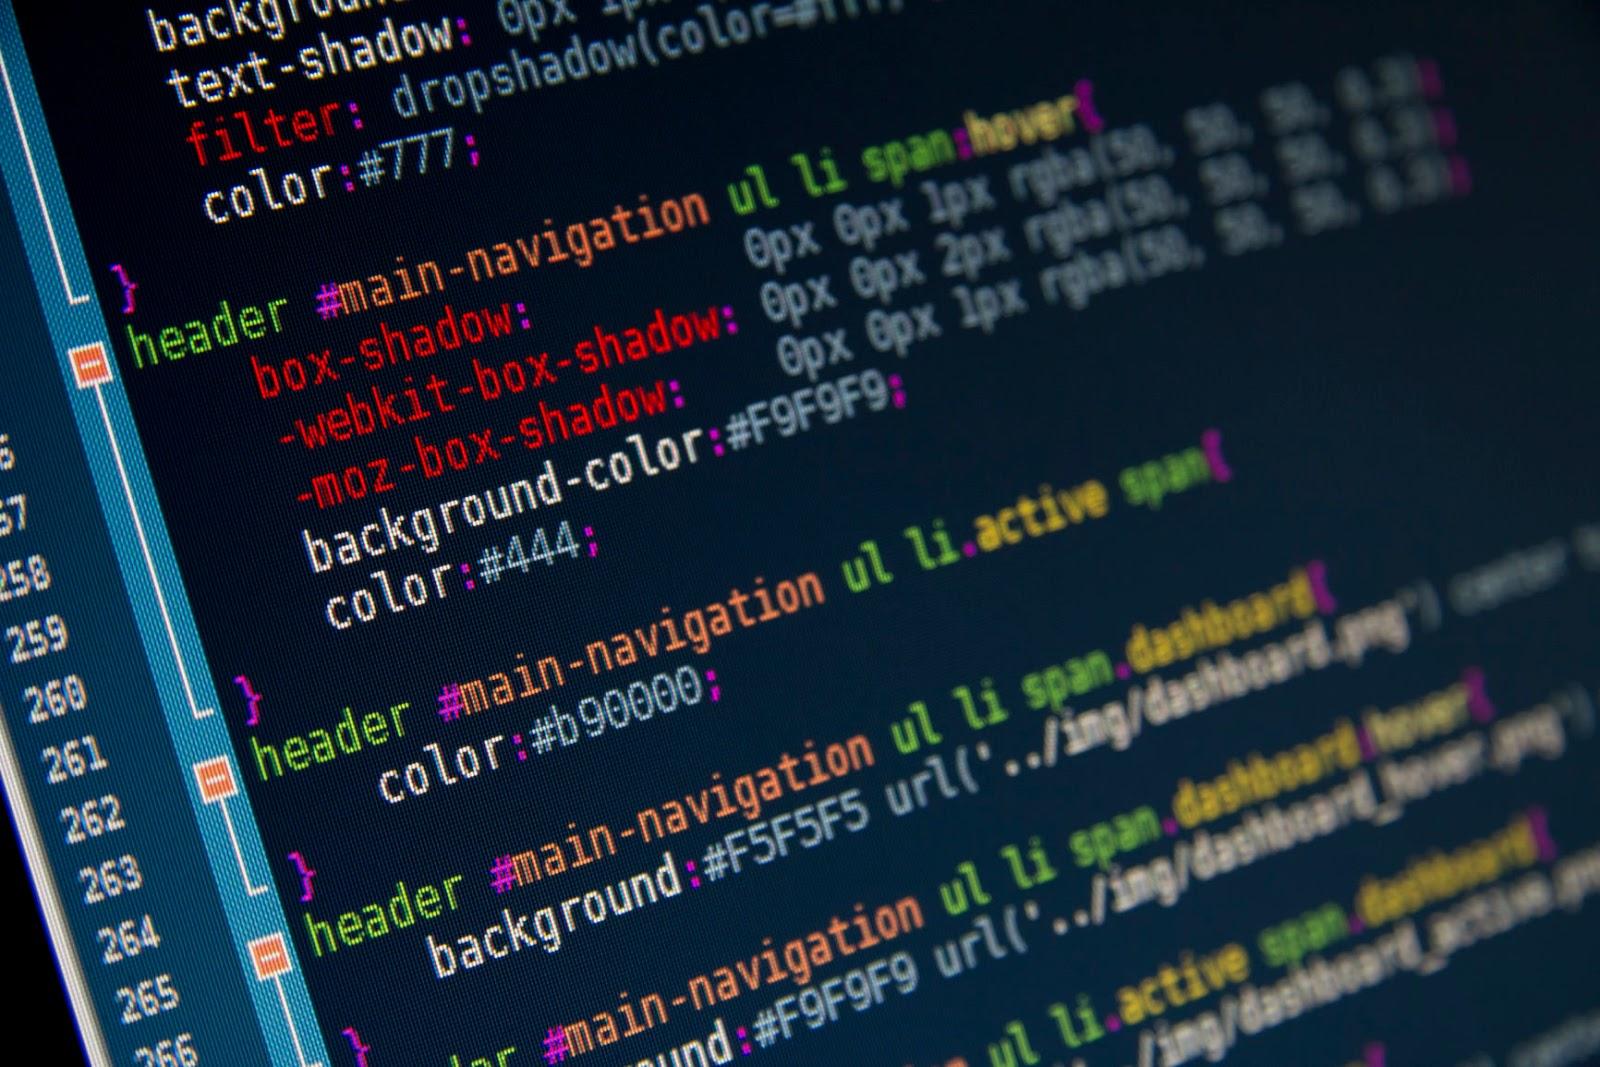 Keylogger CSS - Extensão do Chrome - FULL CRYPTERS